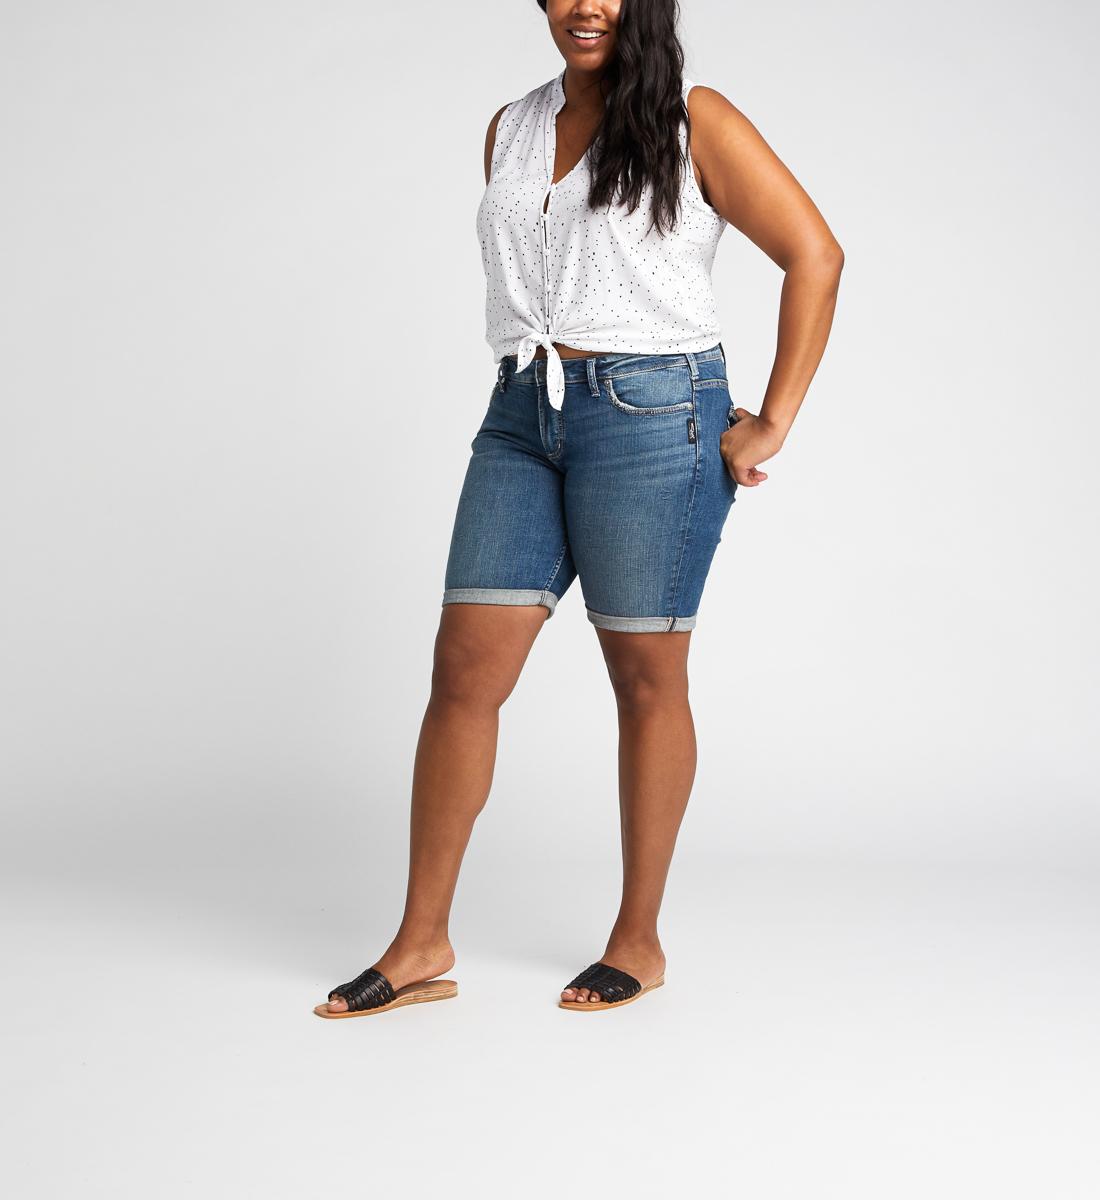 66d1df5e98 Elyse Mid Rise Bermuda Short Plus Size, , hi-res. SKU # W53015SJL373. Silver  Jeans